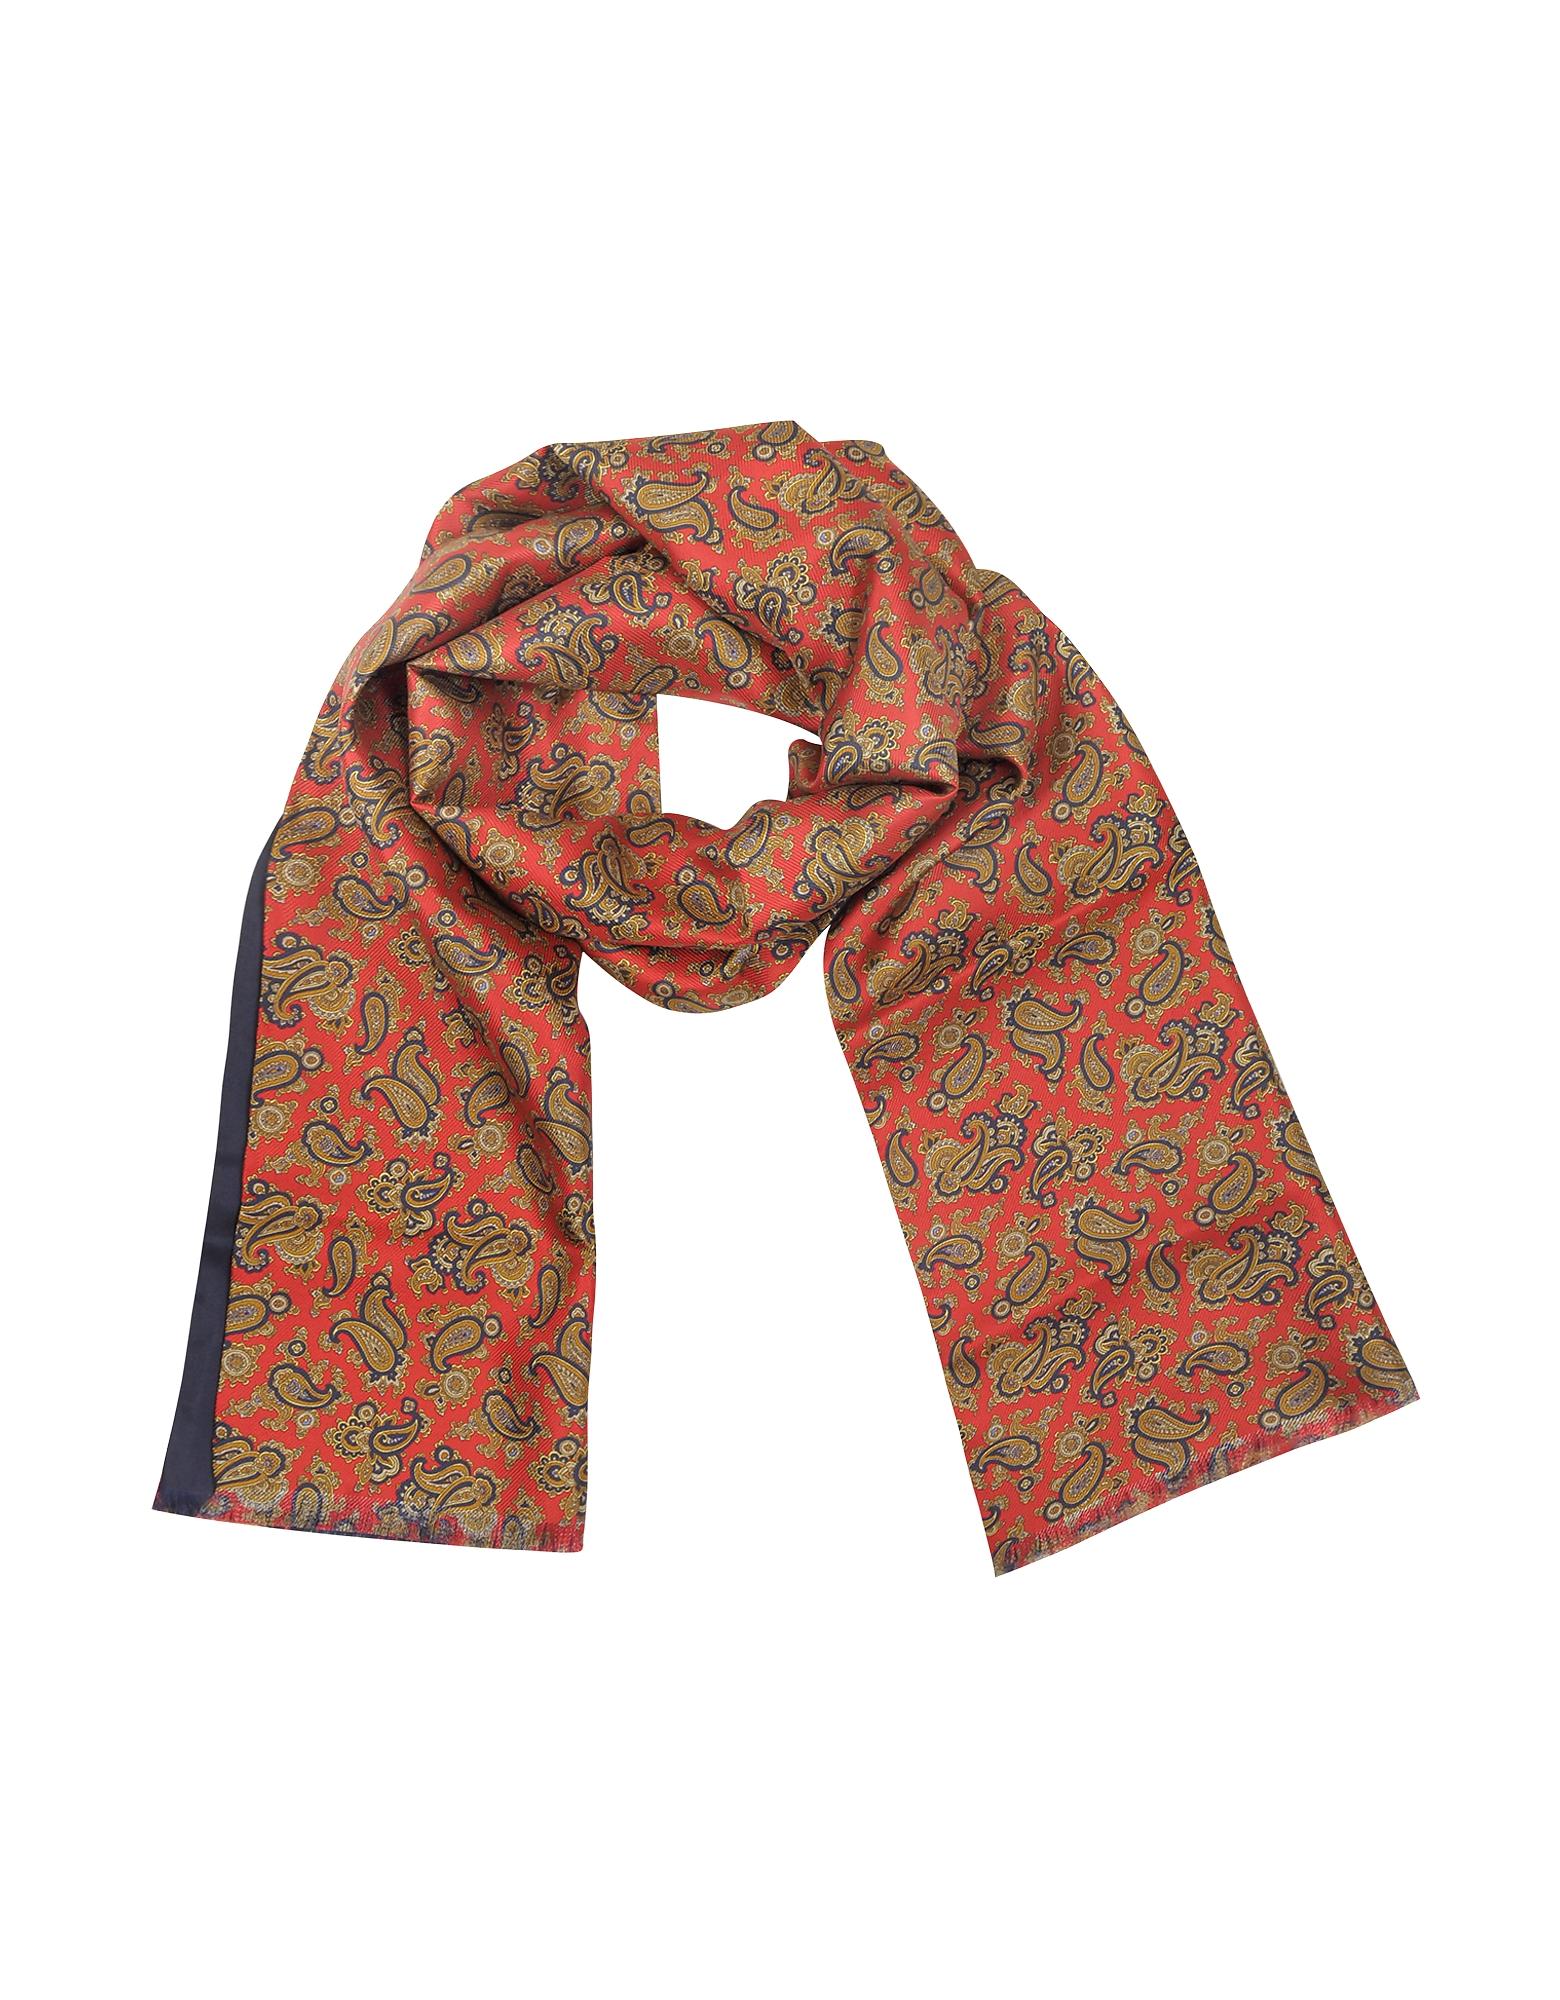 Forzieri Men's Scarves, Maxi Paisley Print Silk Reversible Men's Scarf